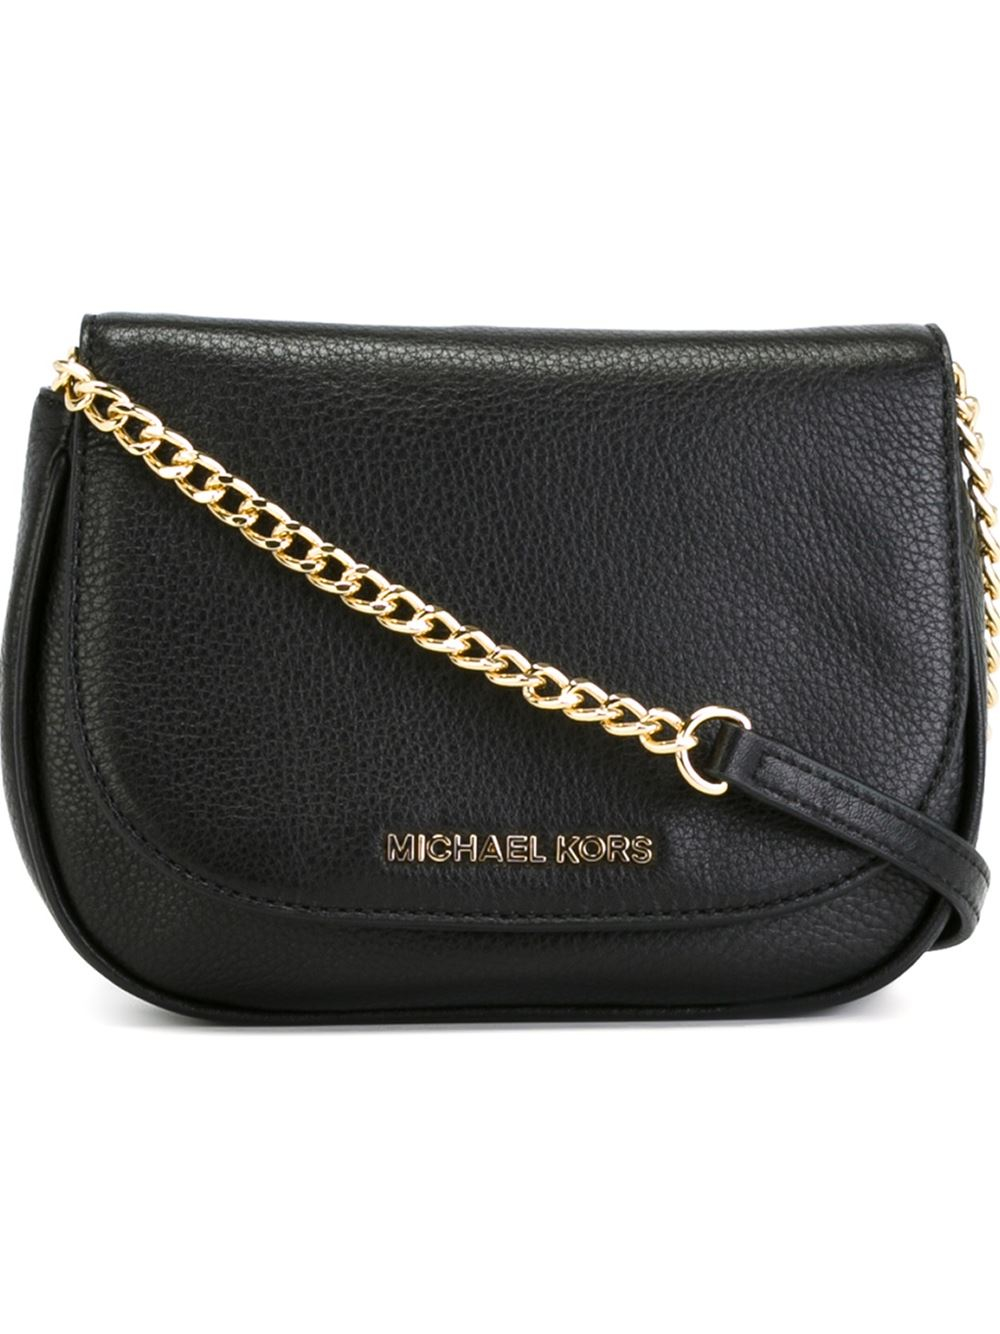 8a19eedb17a8 Lyst - MICHAEL Michael Kors Small  bedford  Crossbody Bag in Black